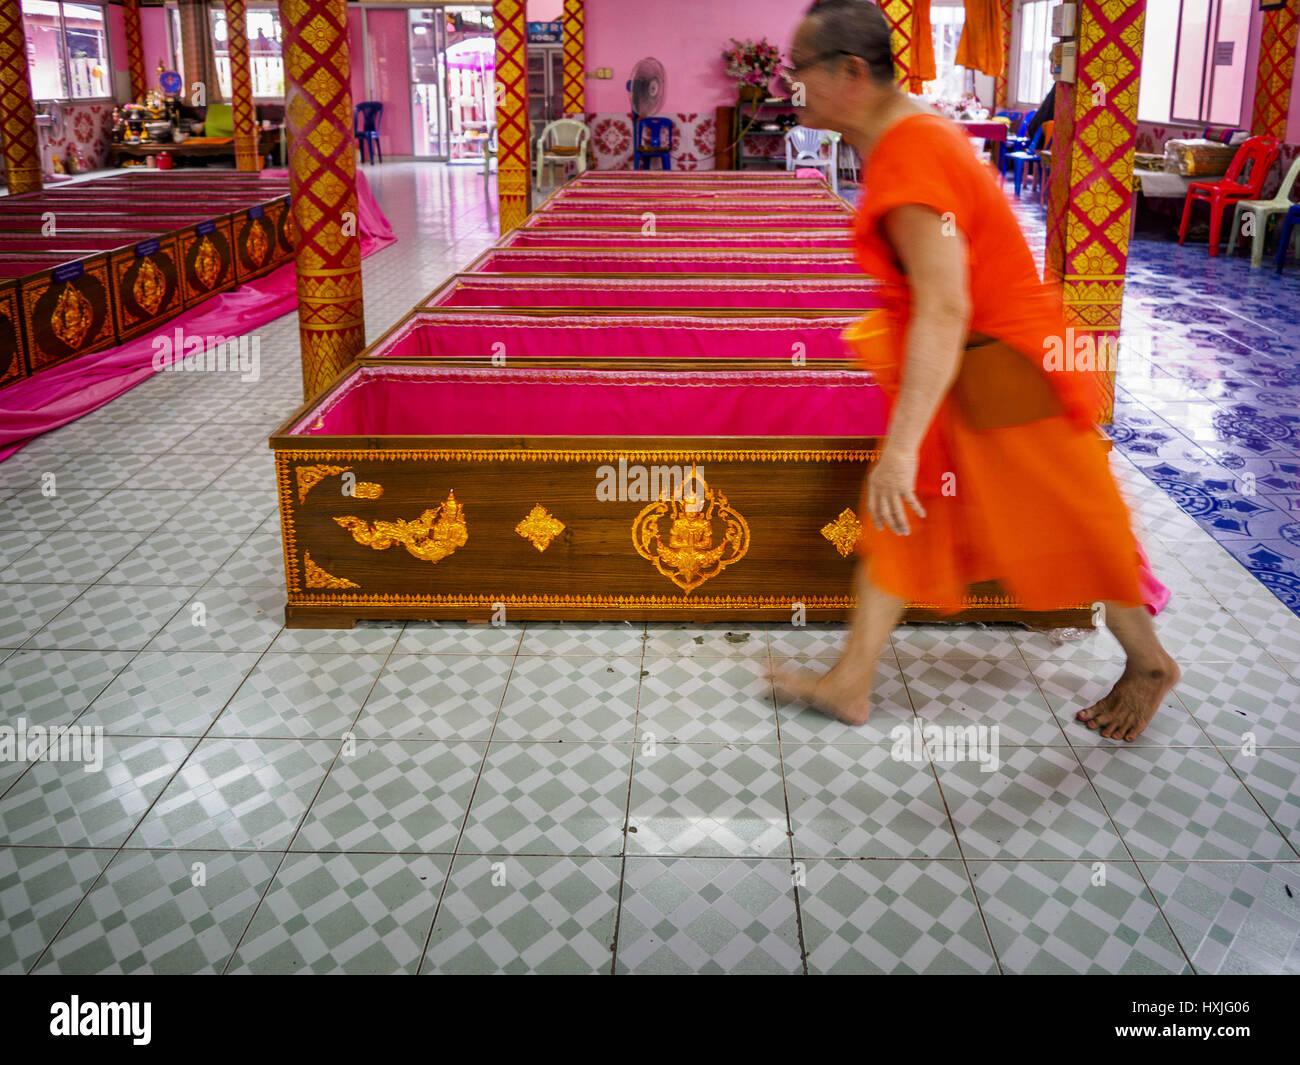 Bang Kruai, Nonthaburi, Tailandia. 29 Mar, 2017. Un monje budista camina pasado una fila de ataúdes después Imagen De Stock